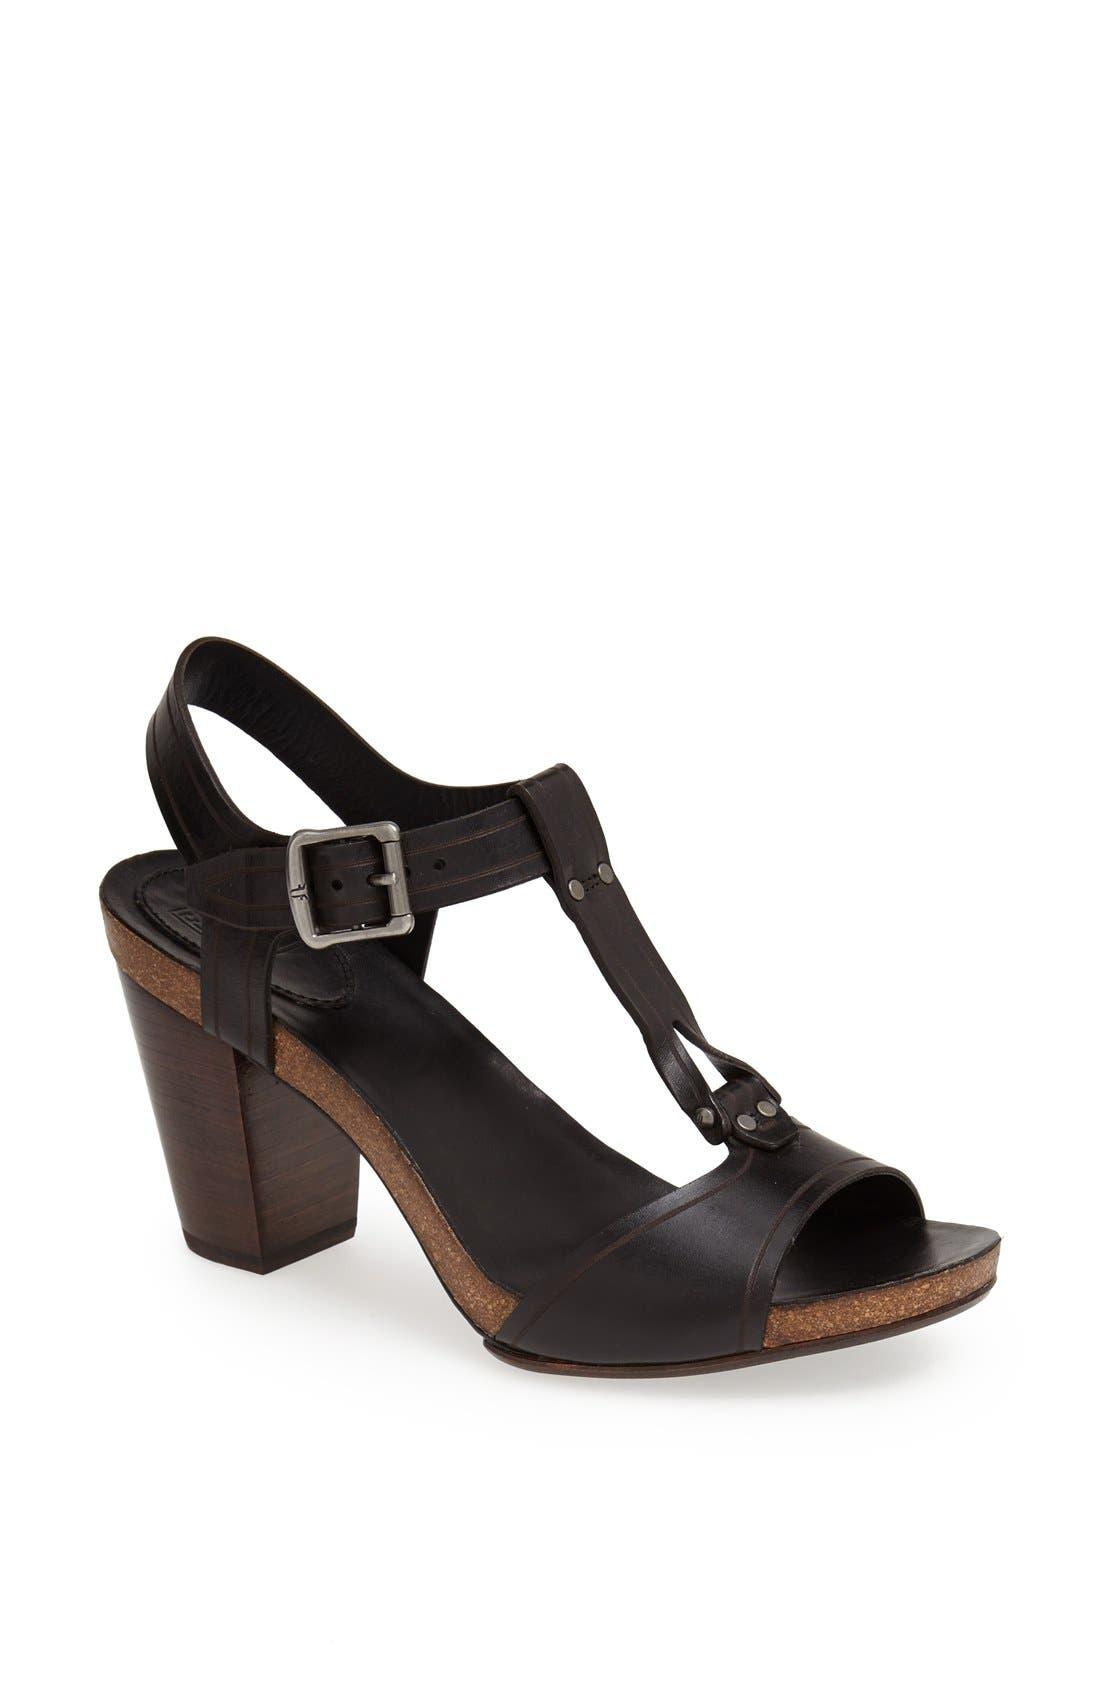 FRYE, 'Silvie' Y-Strap Leather Sandal, Main thumbnail 1, color, 001